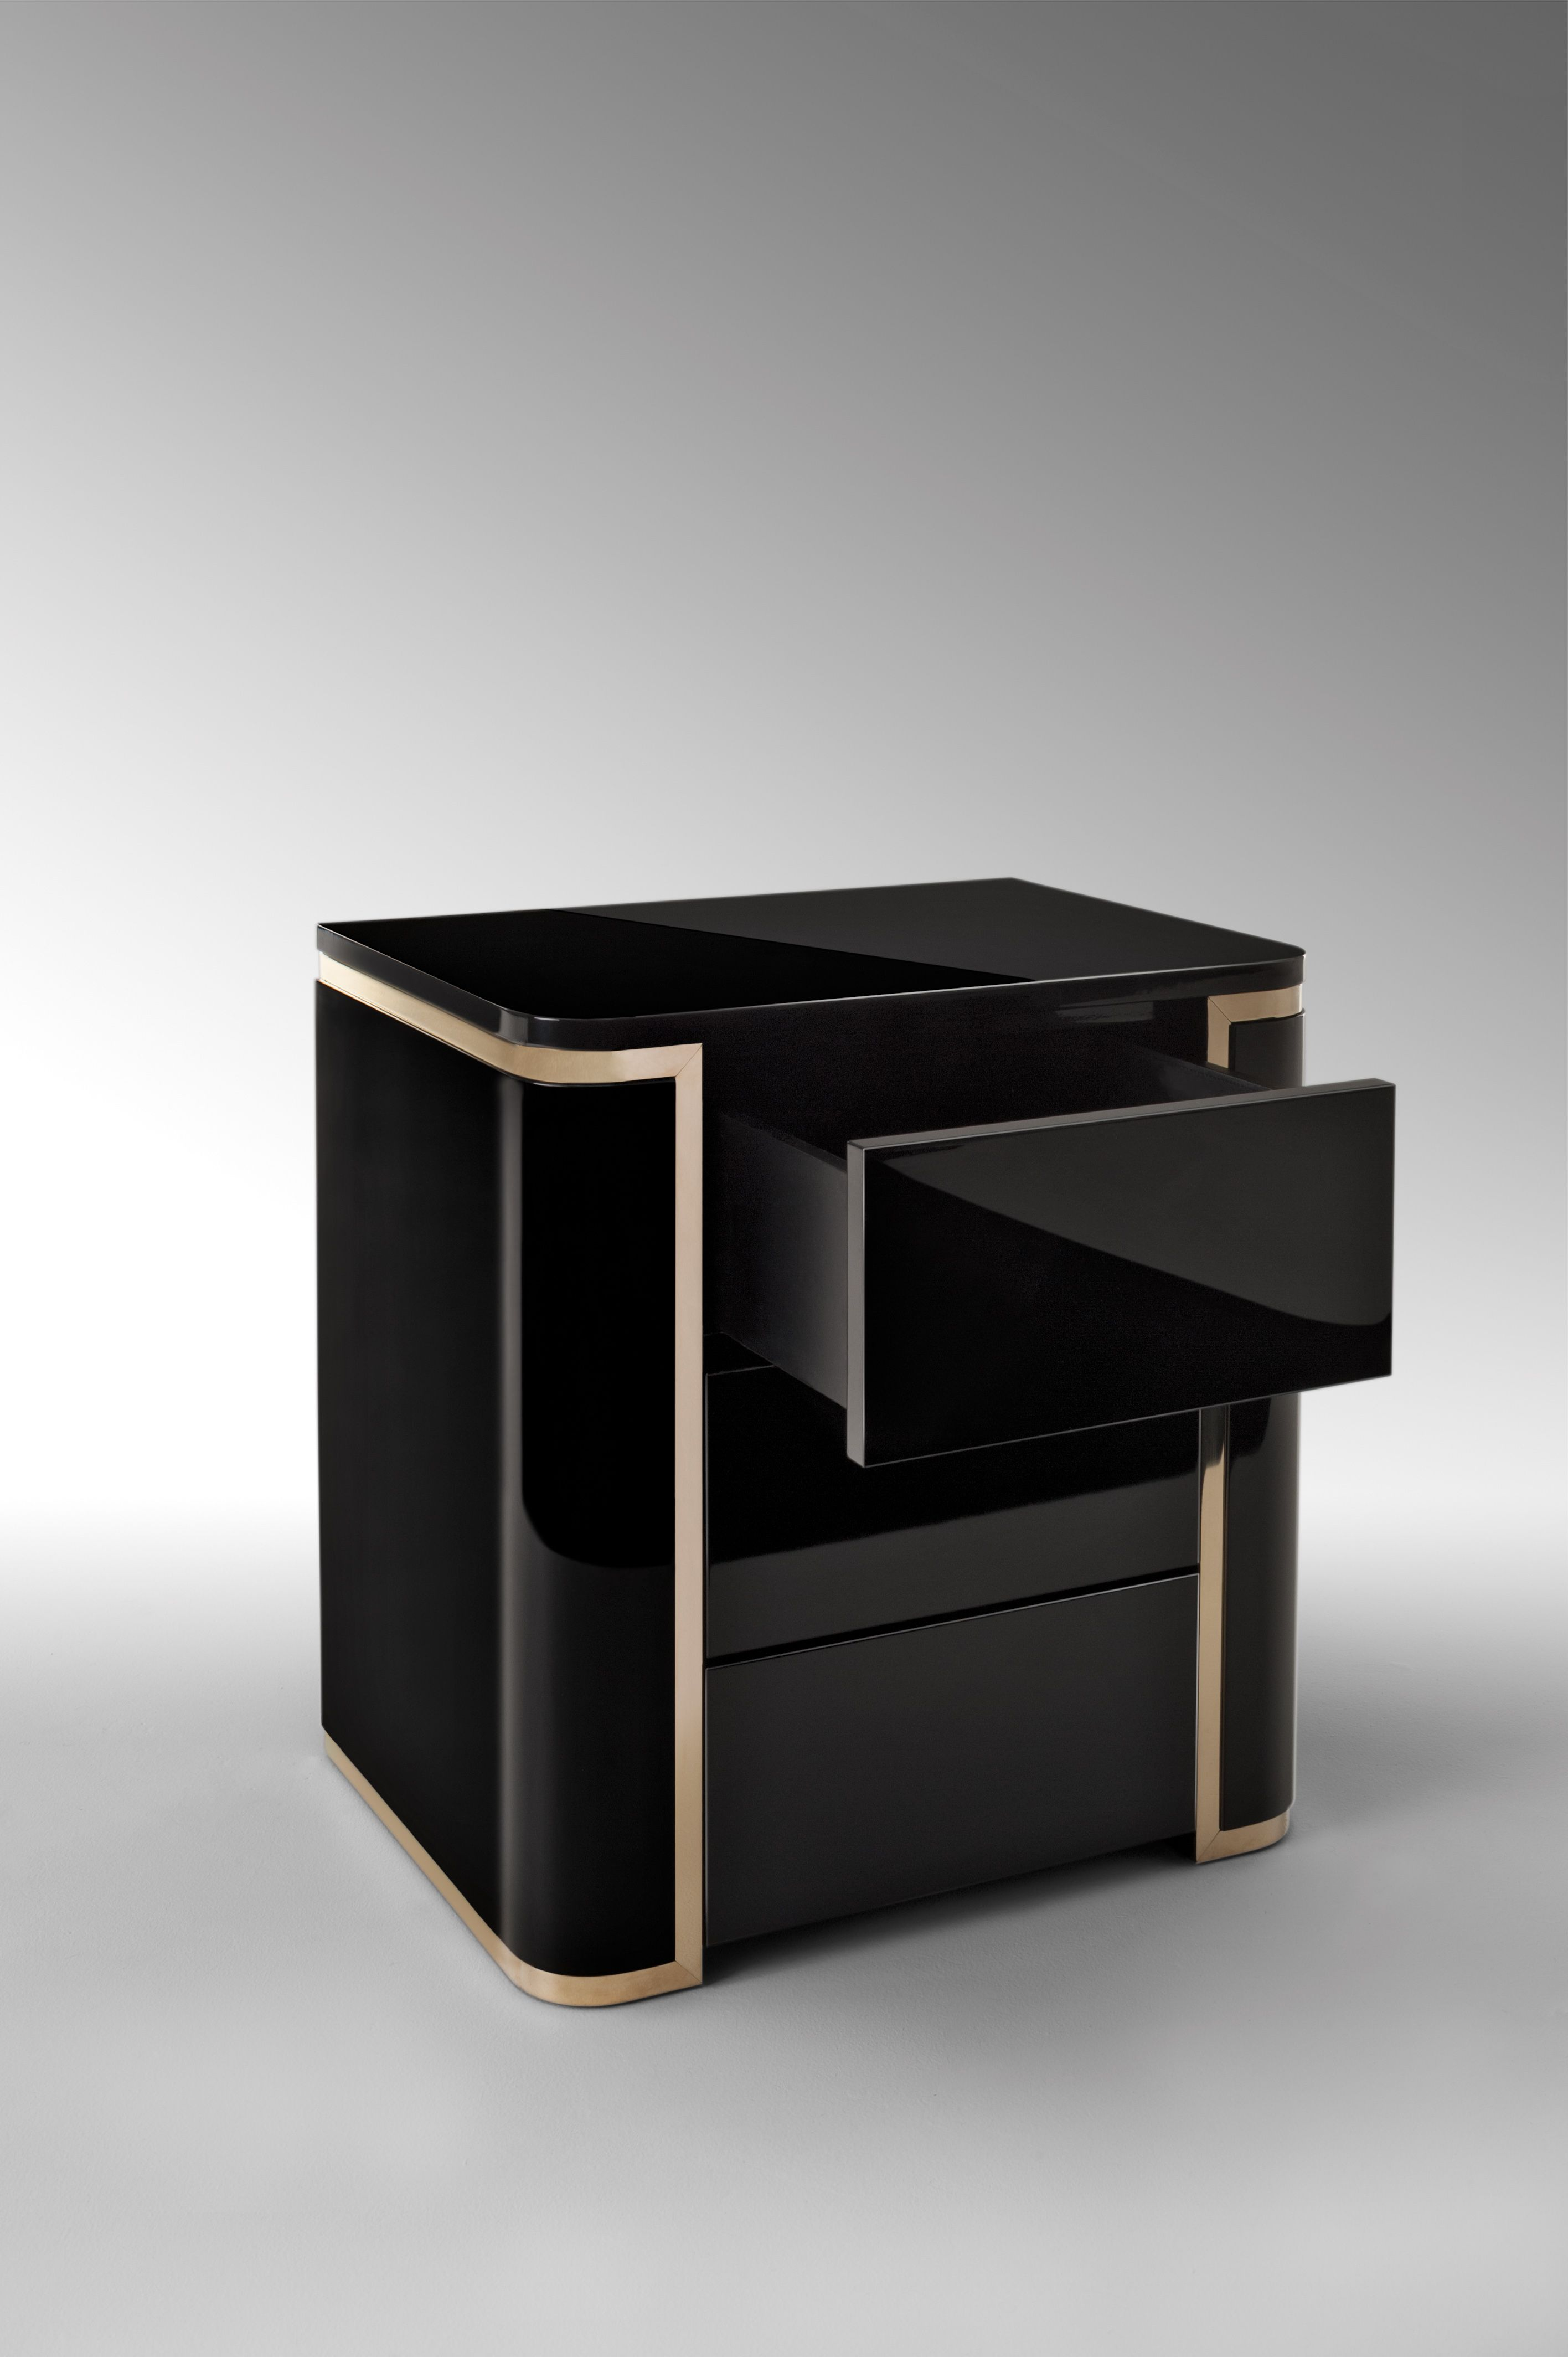 Black Fendi Nightstand Black It S Always An Amazing Option To  # Muebles Fendi Casa